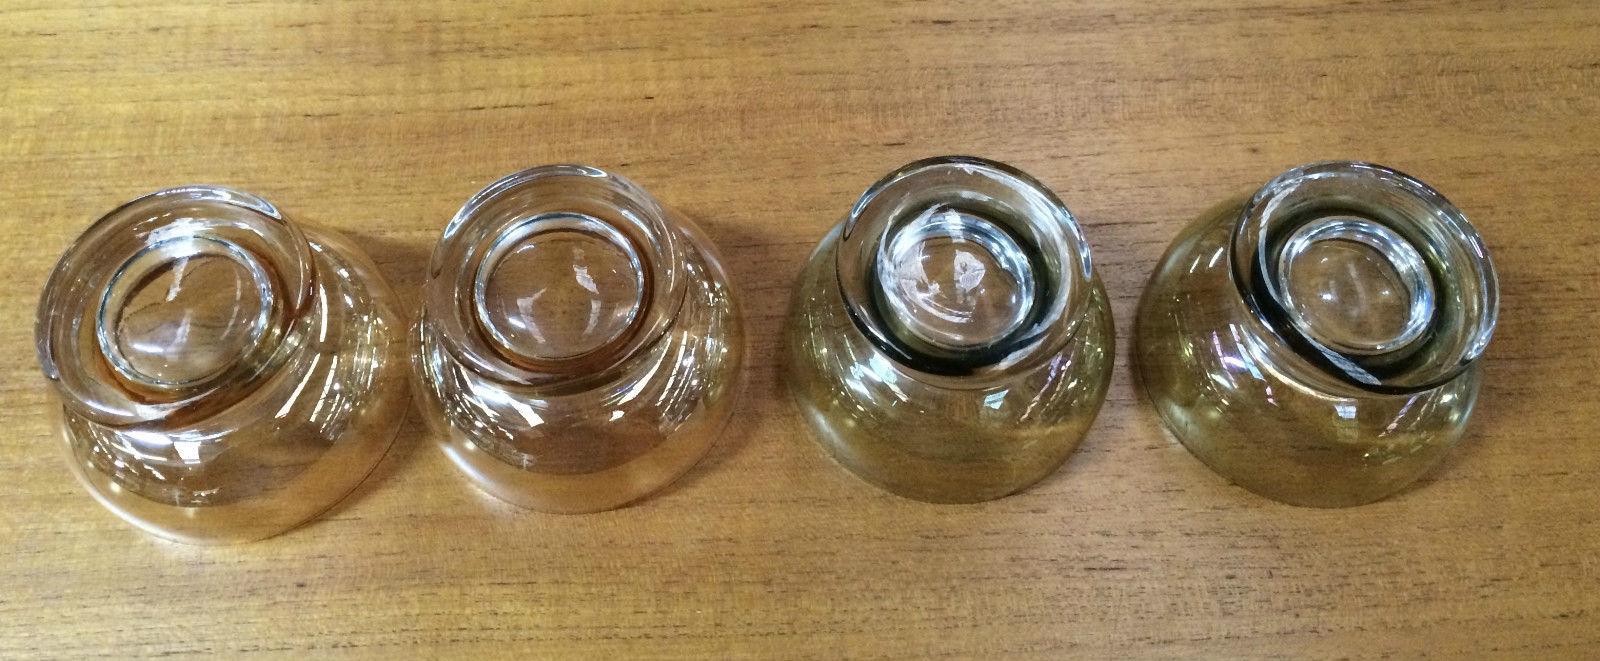 Set Of 4 Vintage Retro 50s Harlequin Lustre Ware Champagne Desert Glasses   Melbourne   Halsey Road Recyclers